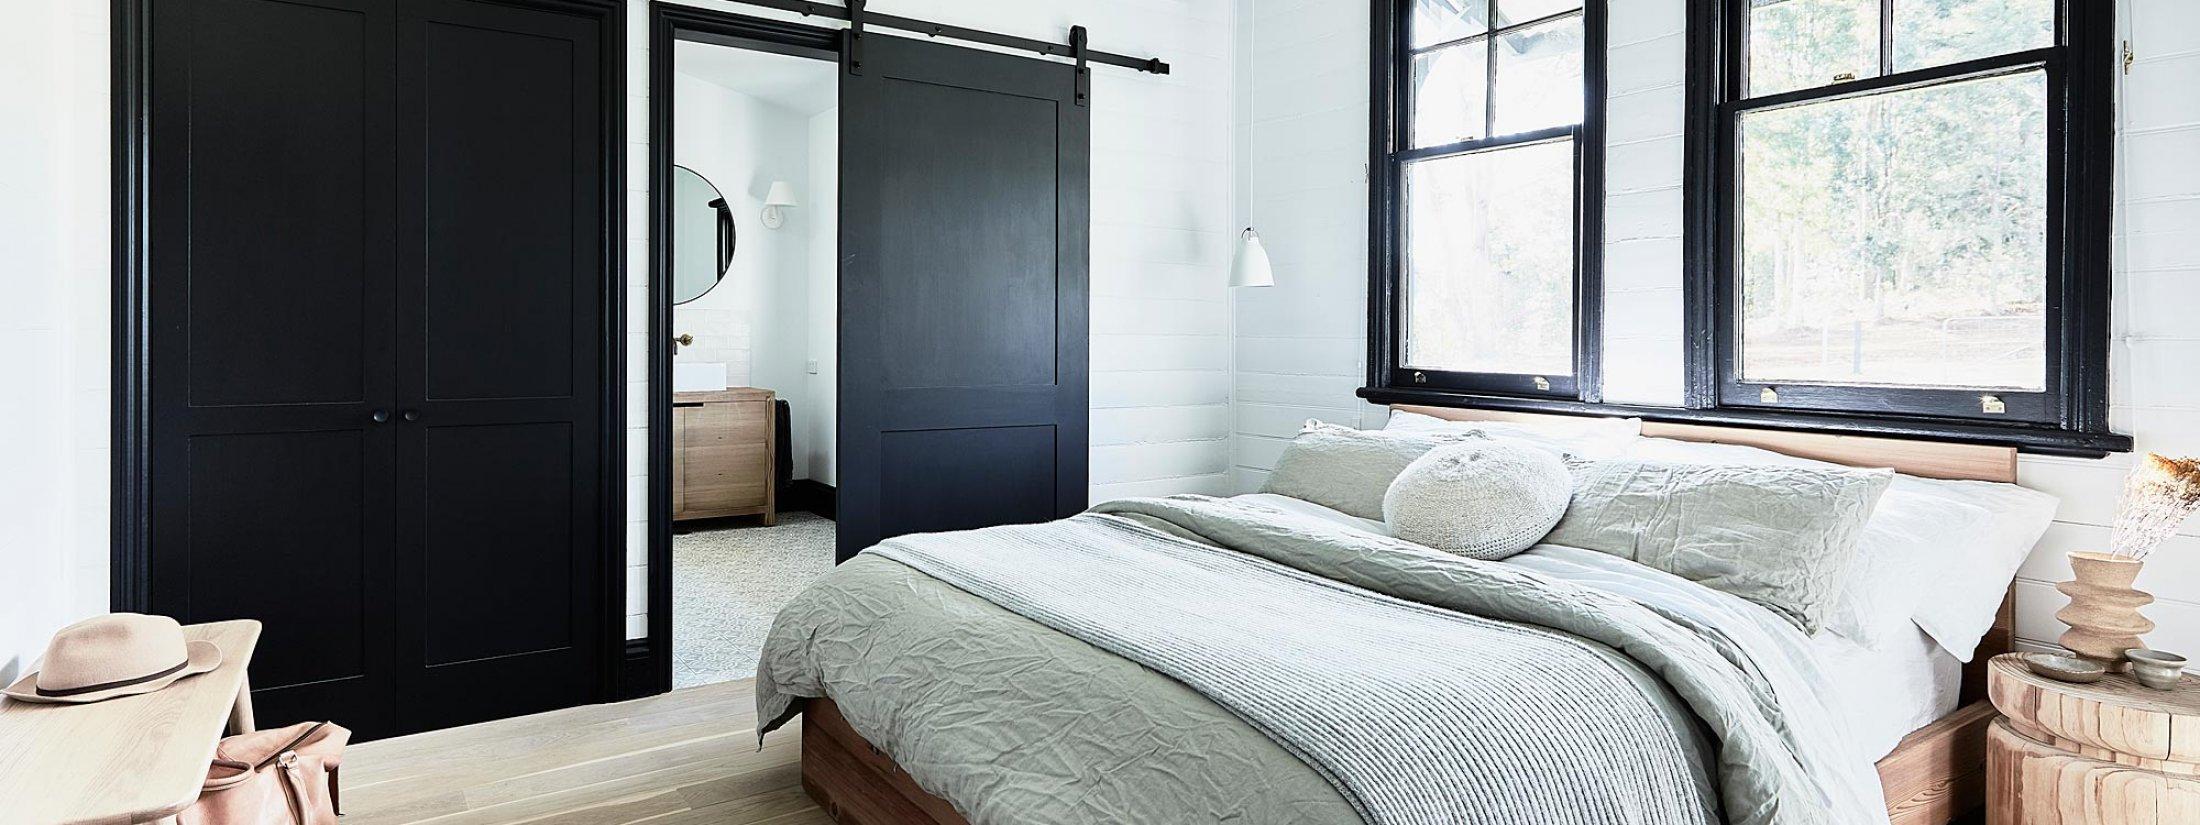 Bennys Cottage - Byron Bay - Real Living Shoot Bedroom 2a